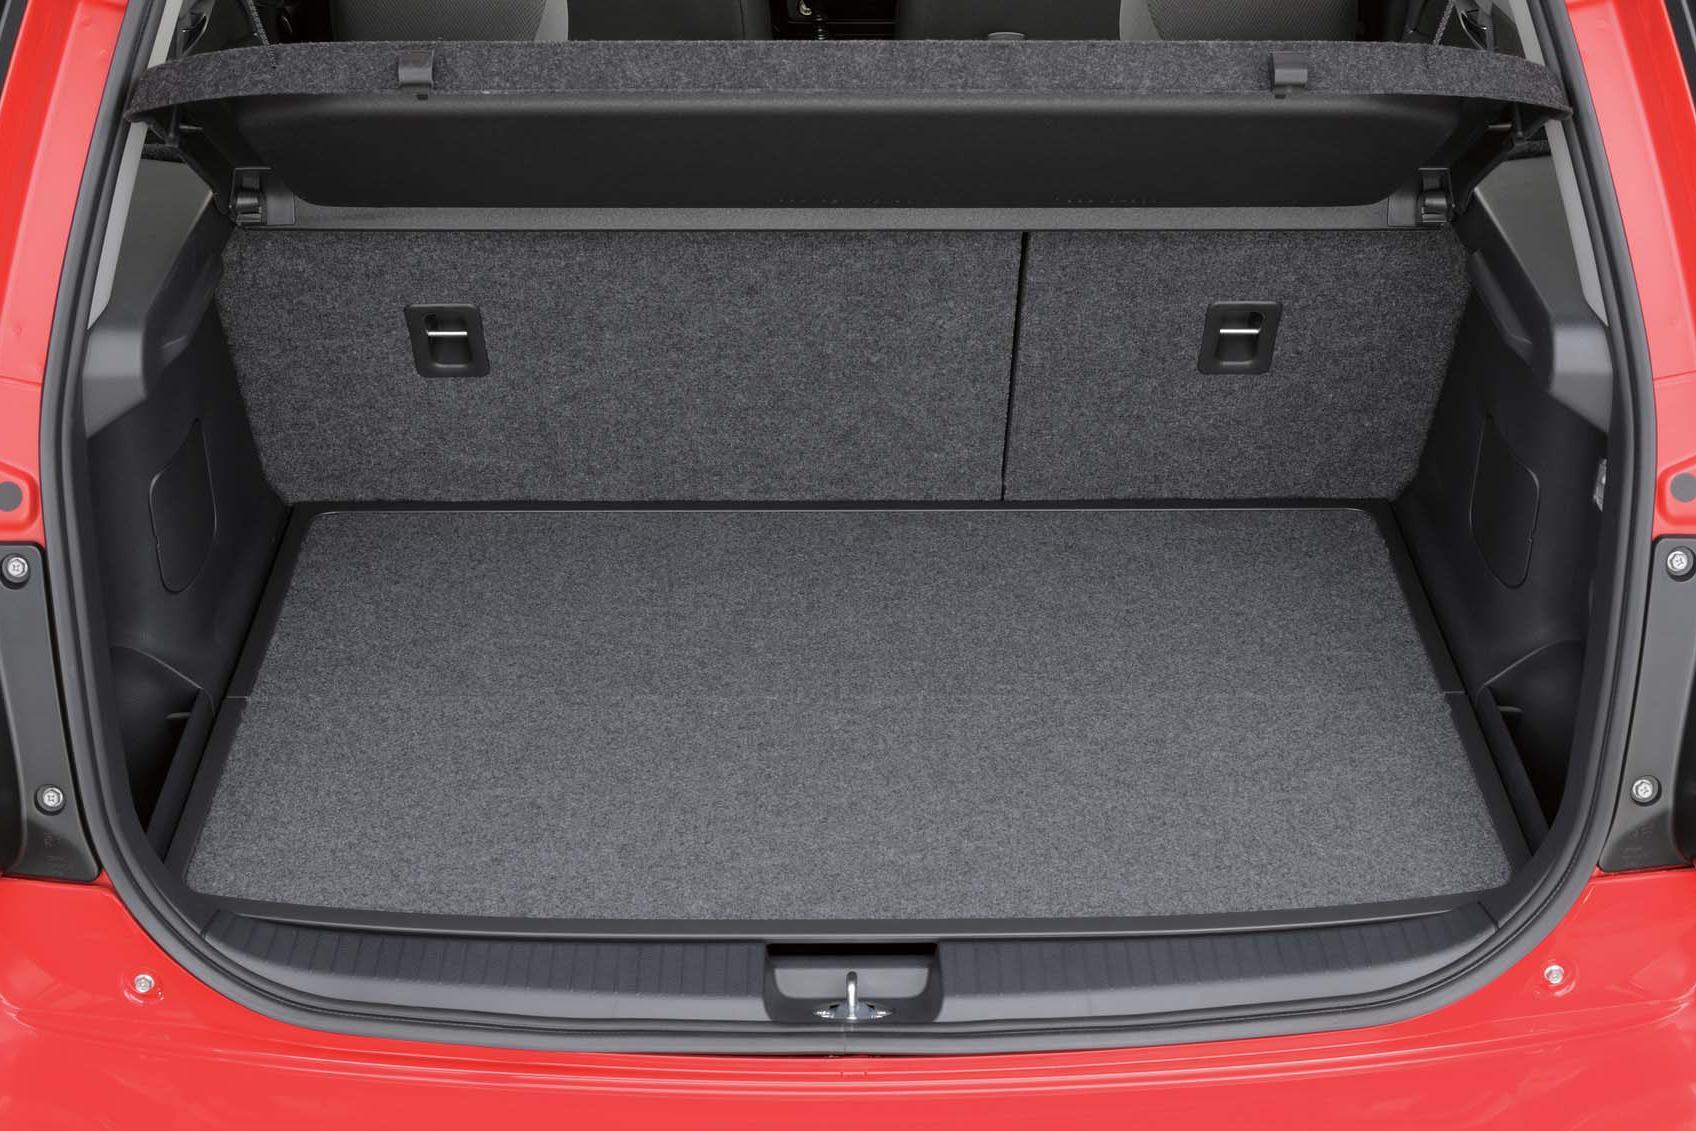 Review: 2011 Suzuki SX4 SportBack - Autosavant